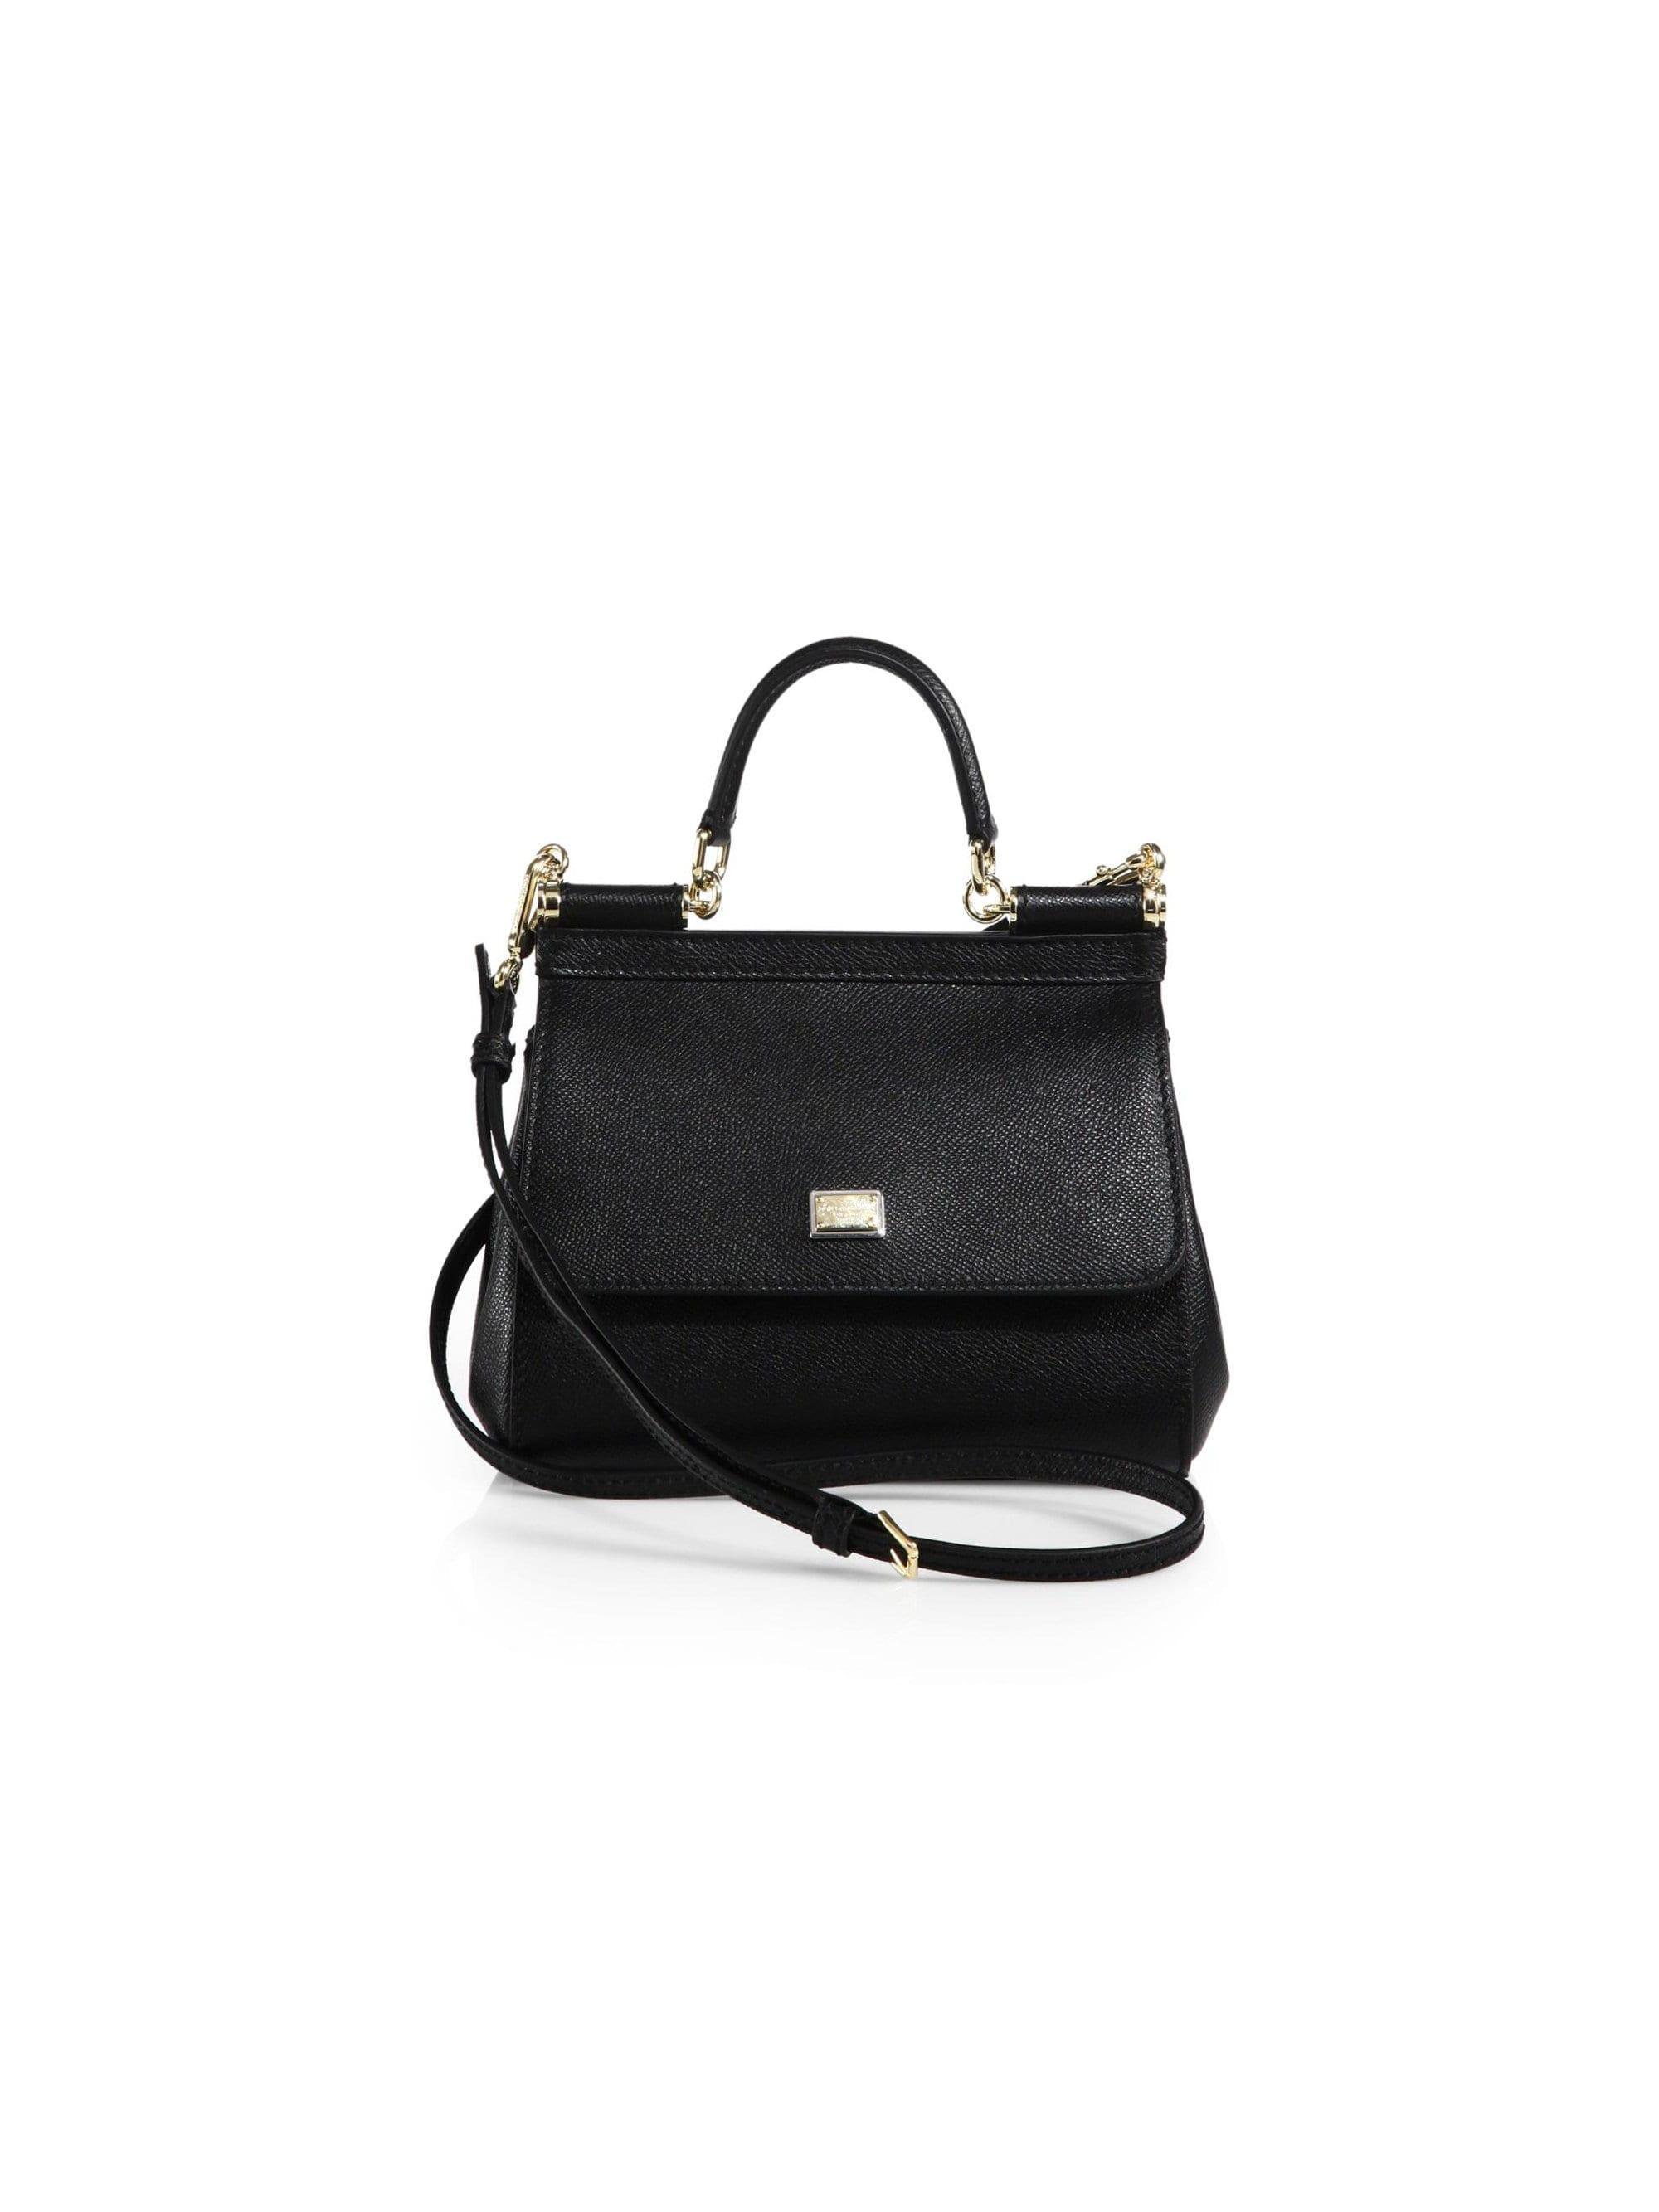 e7f73825f6 Lyst - Dolce   Gabbana Women s Small Sicily Leather Top Handle ...